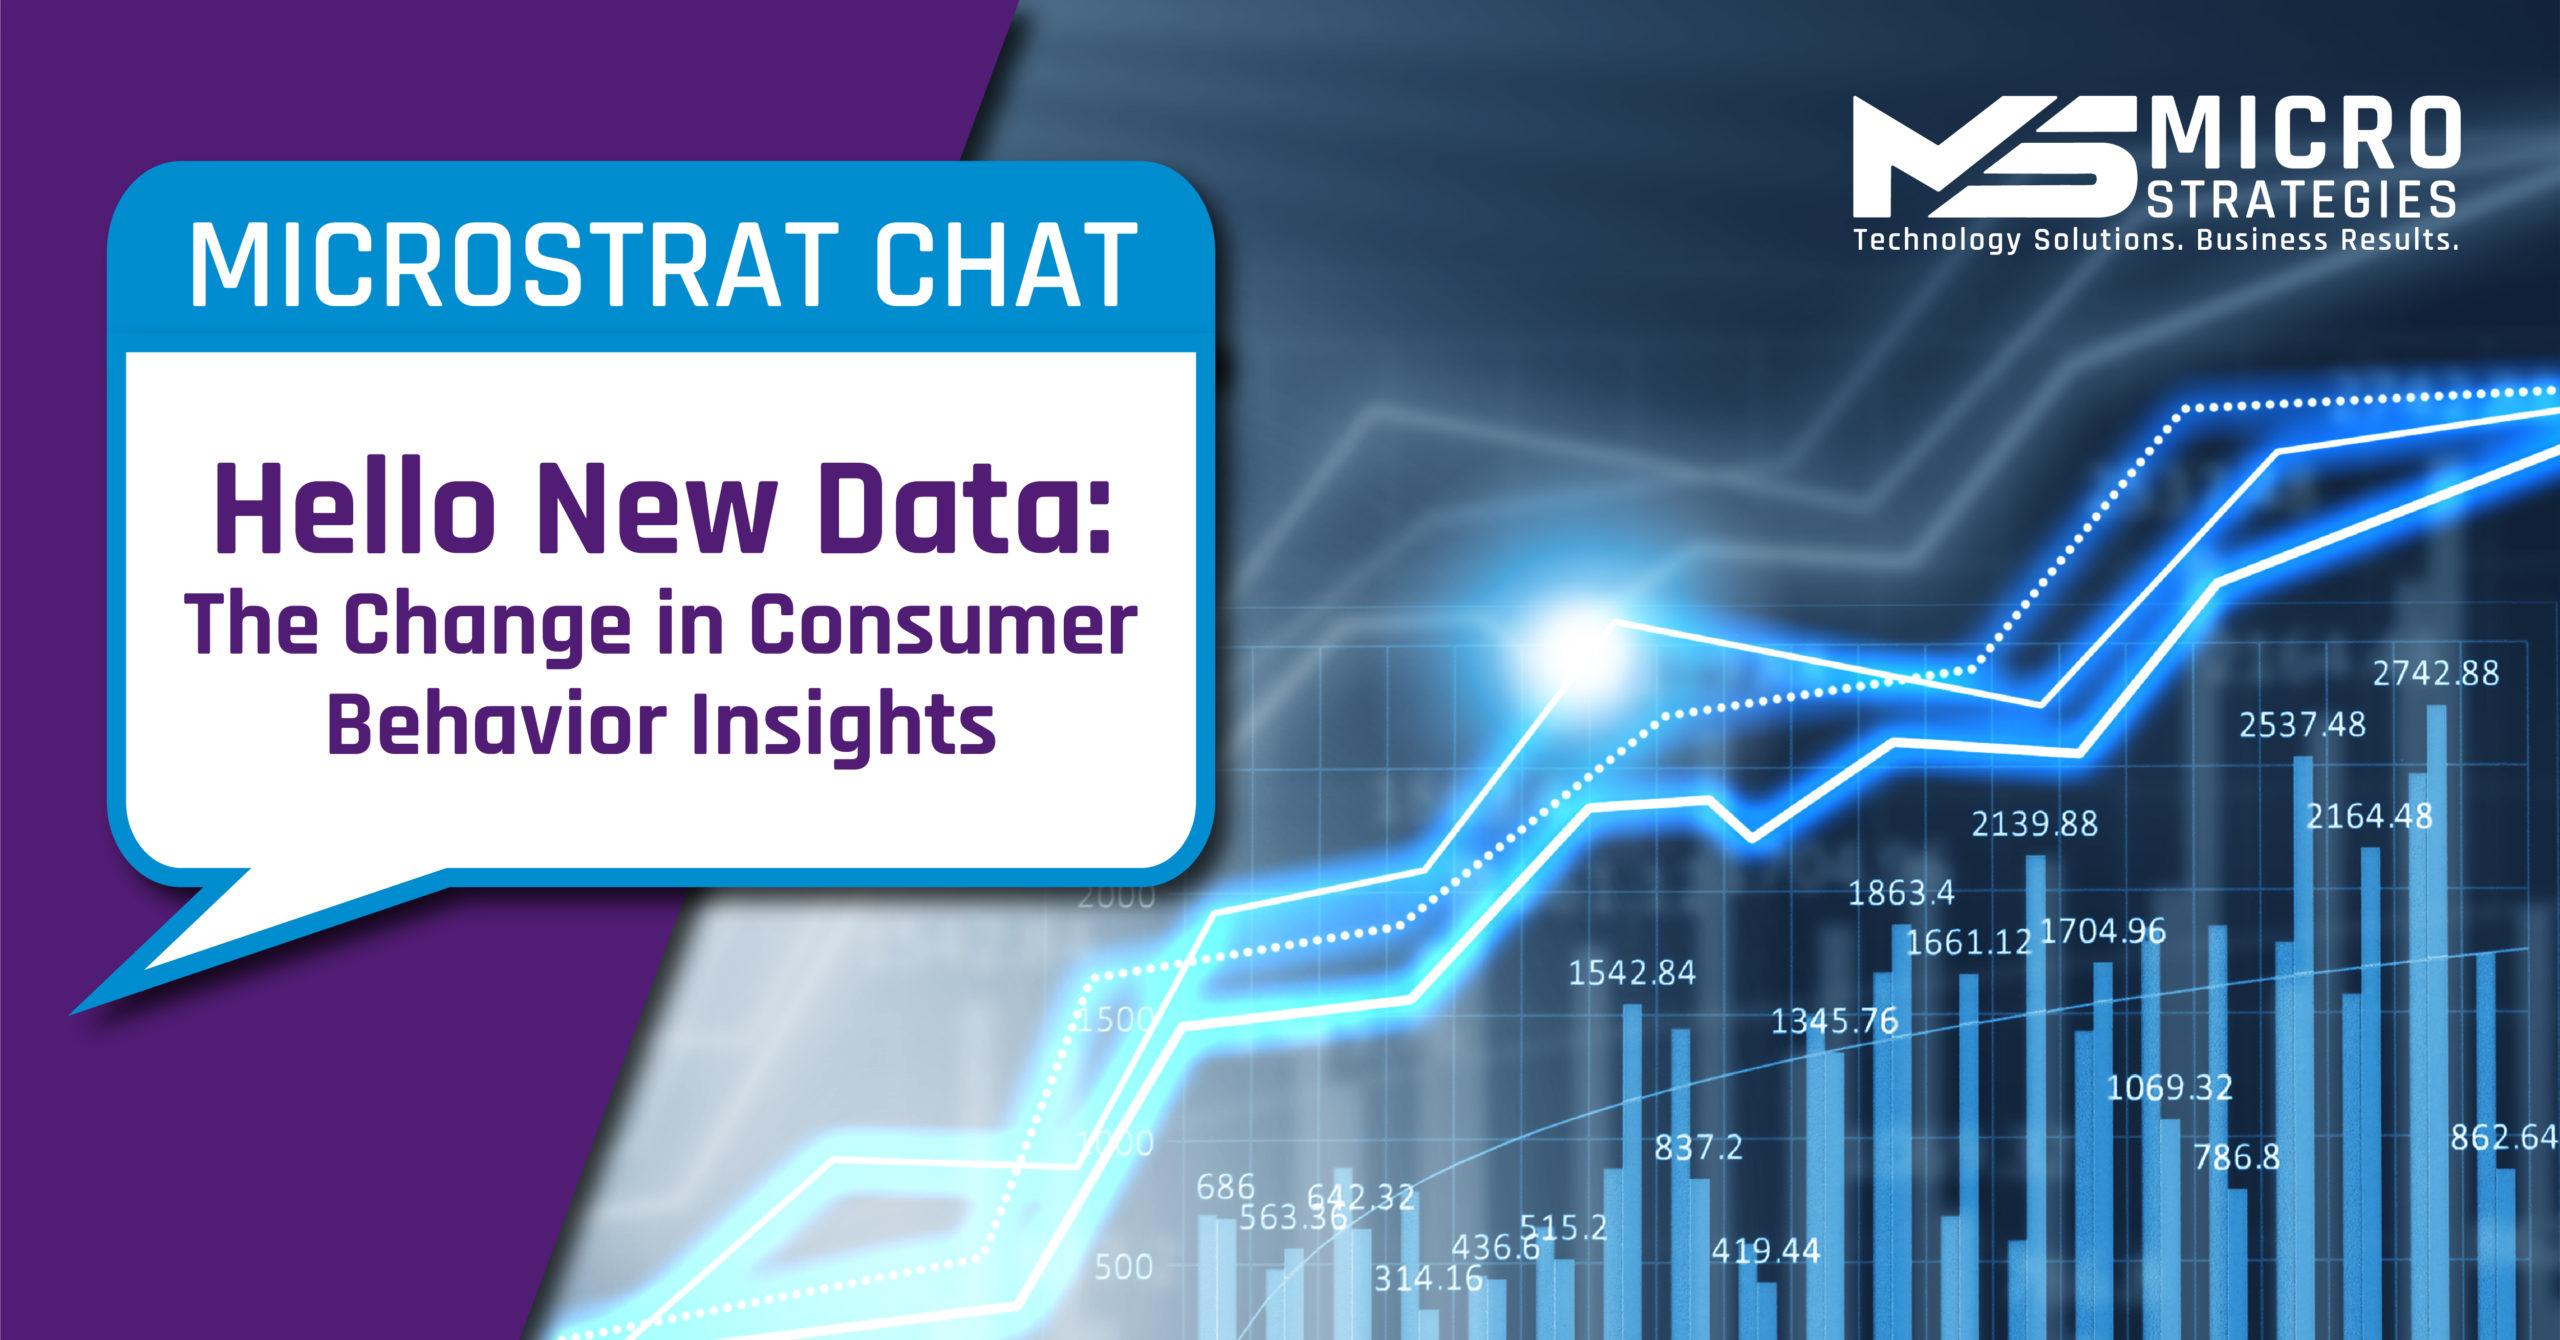 Hello New Data: The Change in Consumer Behavior Insights